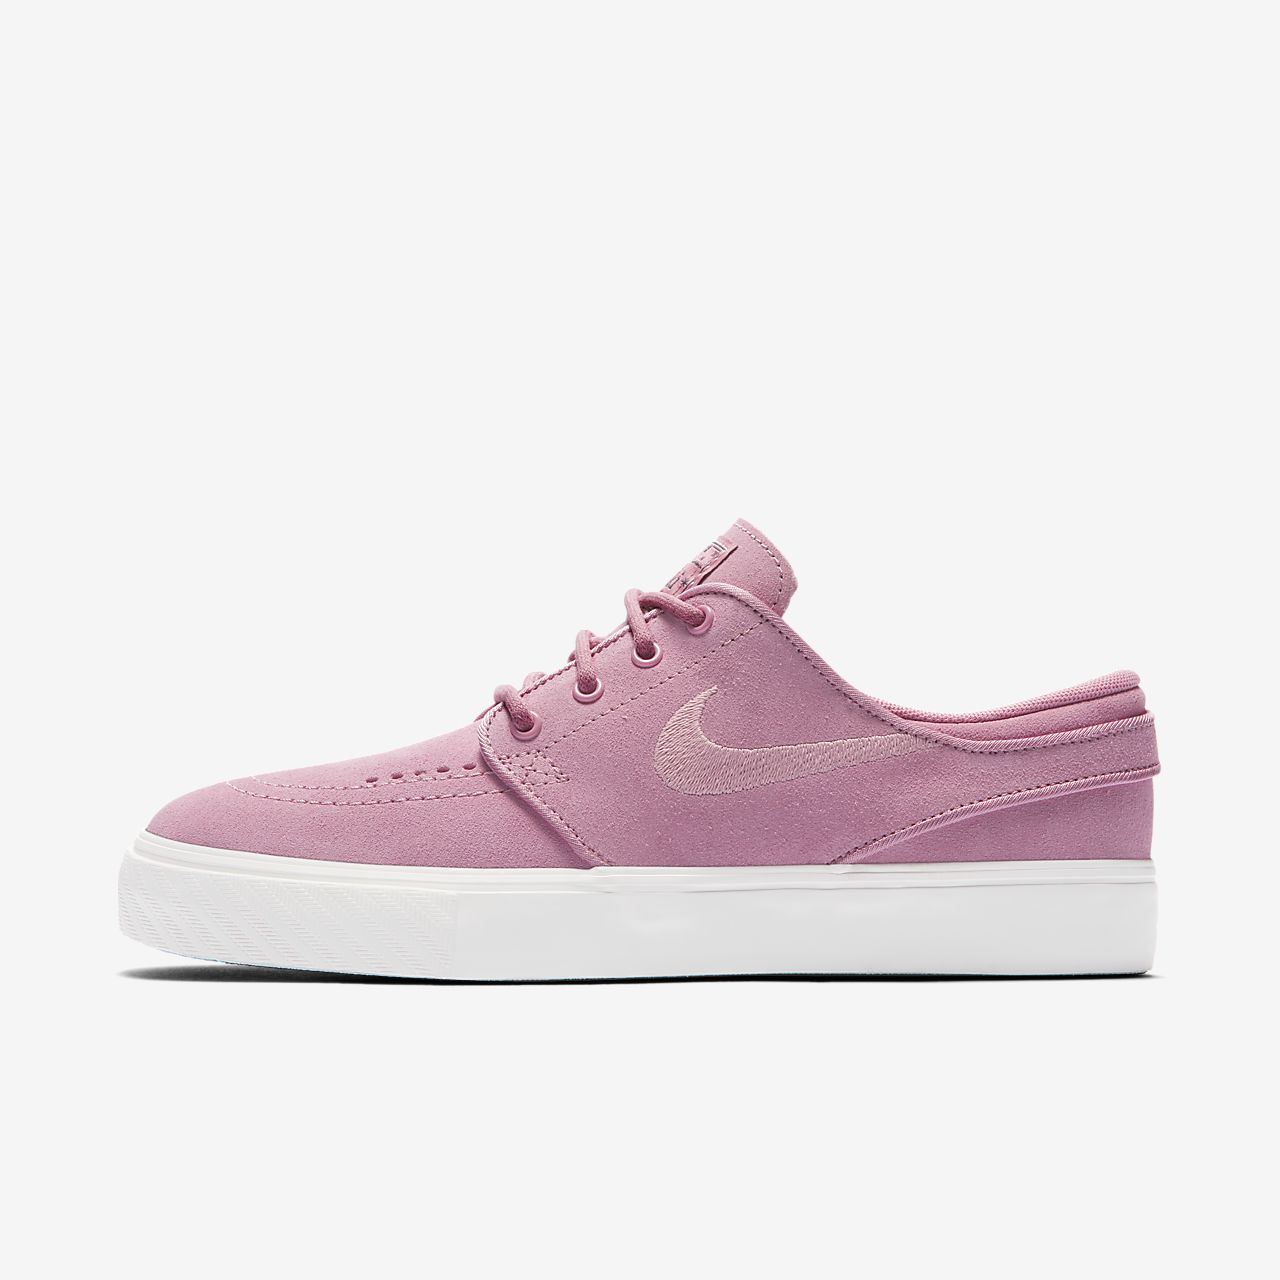 Nike SB Zoom Stefan Janoski  - Girls Skateboarding Shoes - Pink/Blue/White/Pink